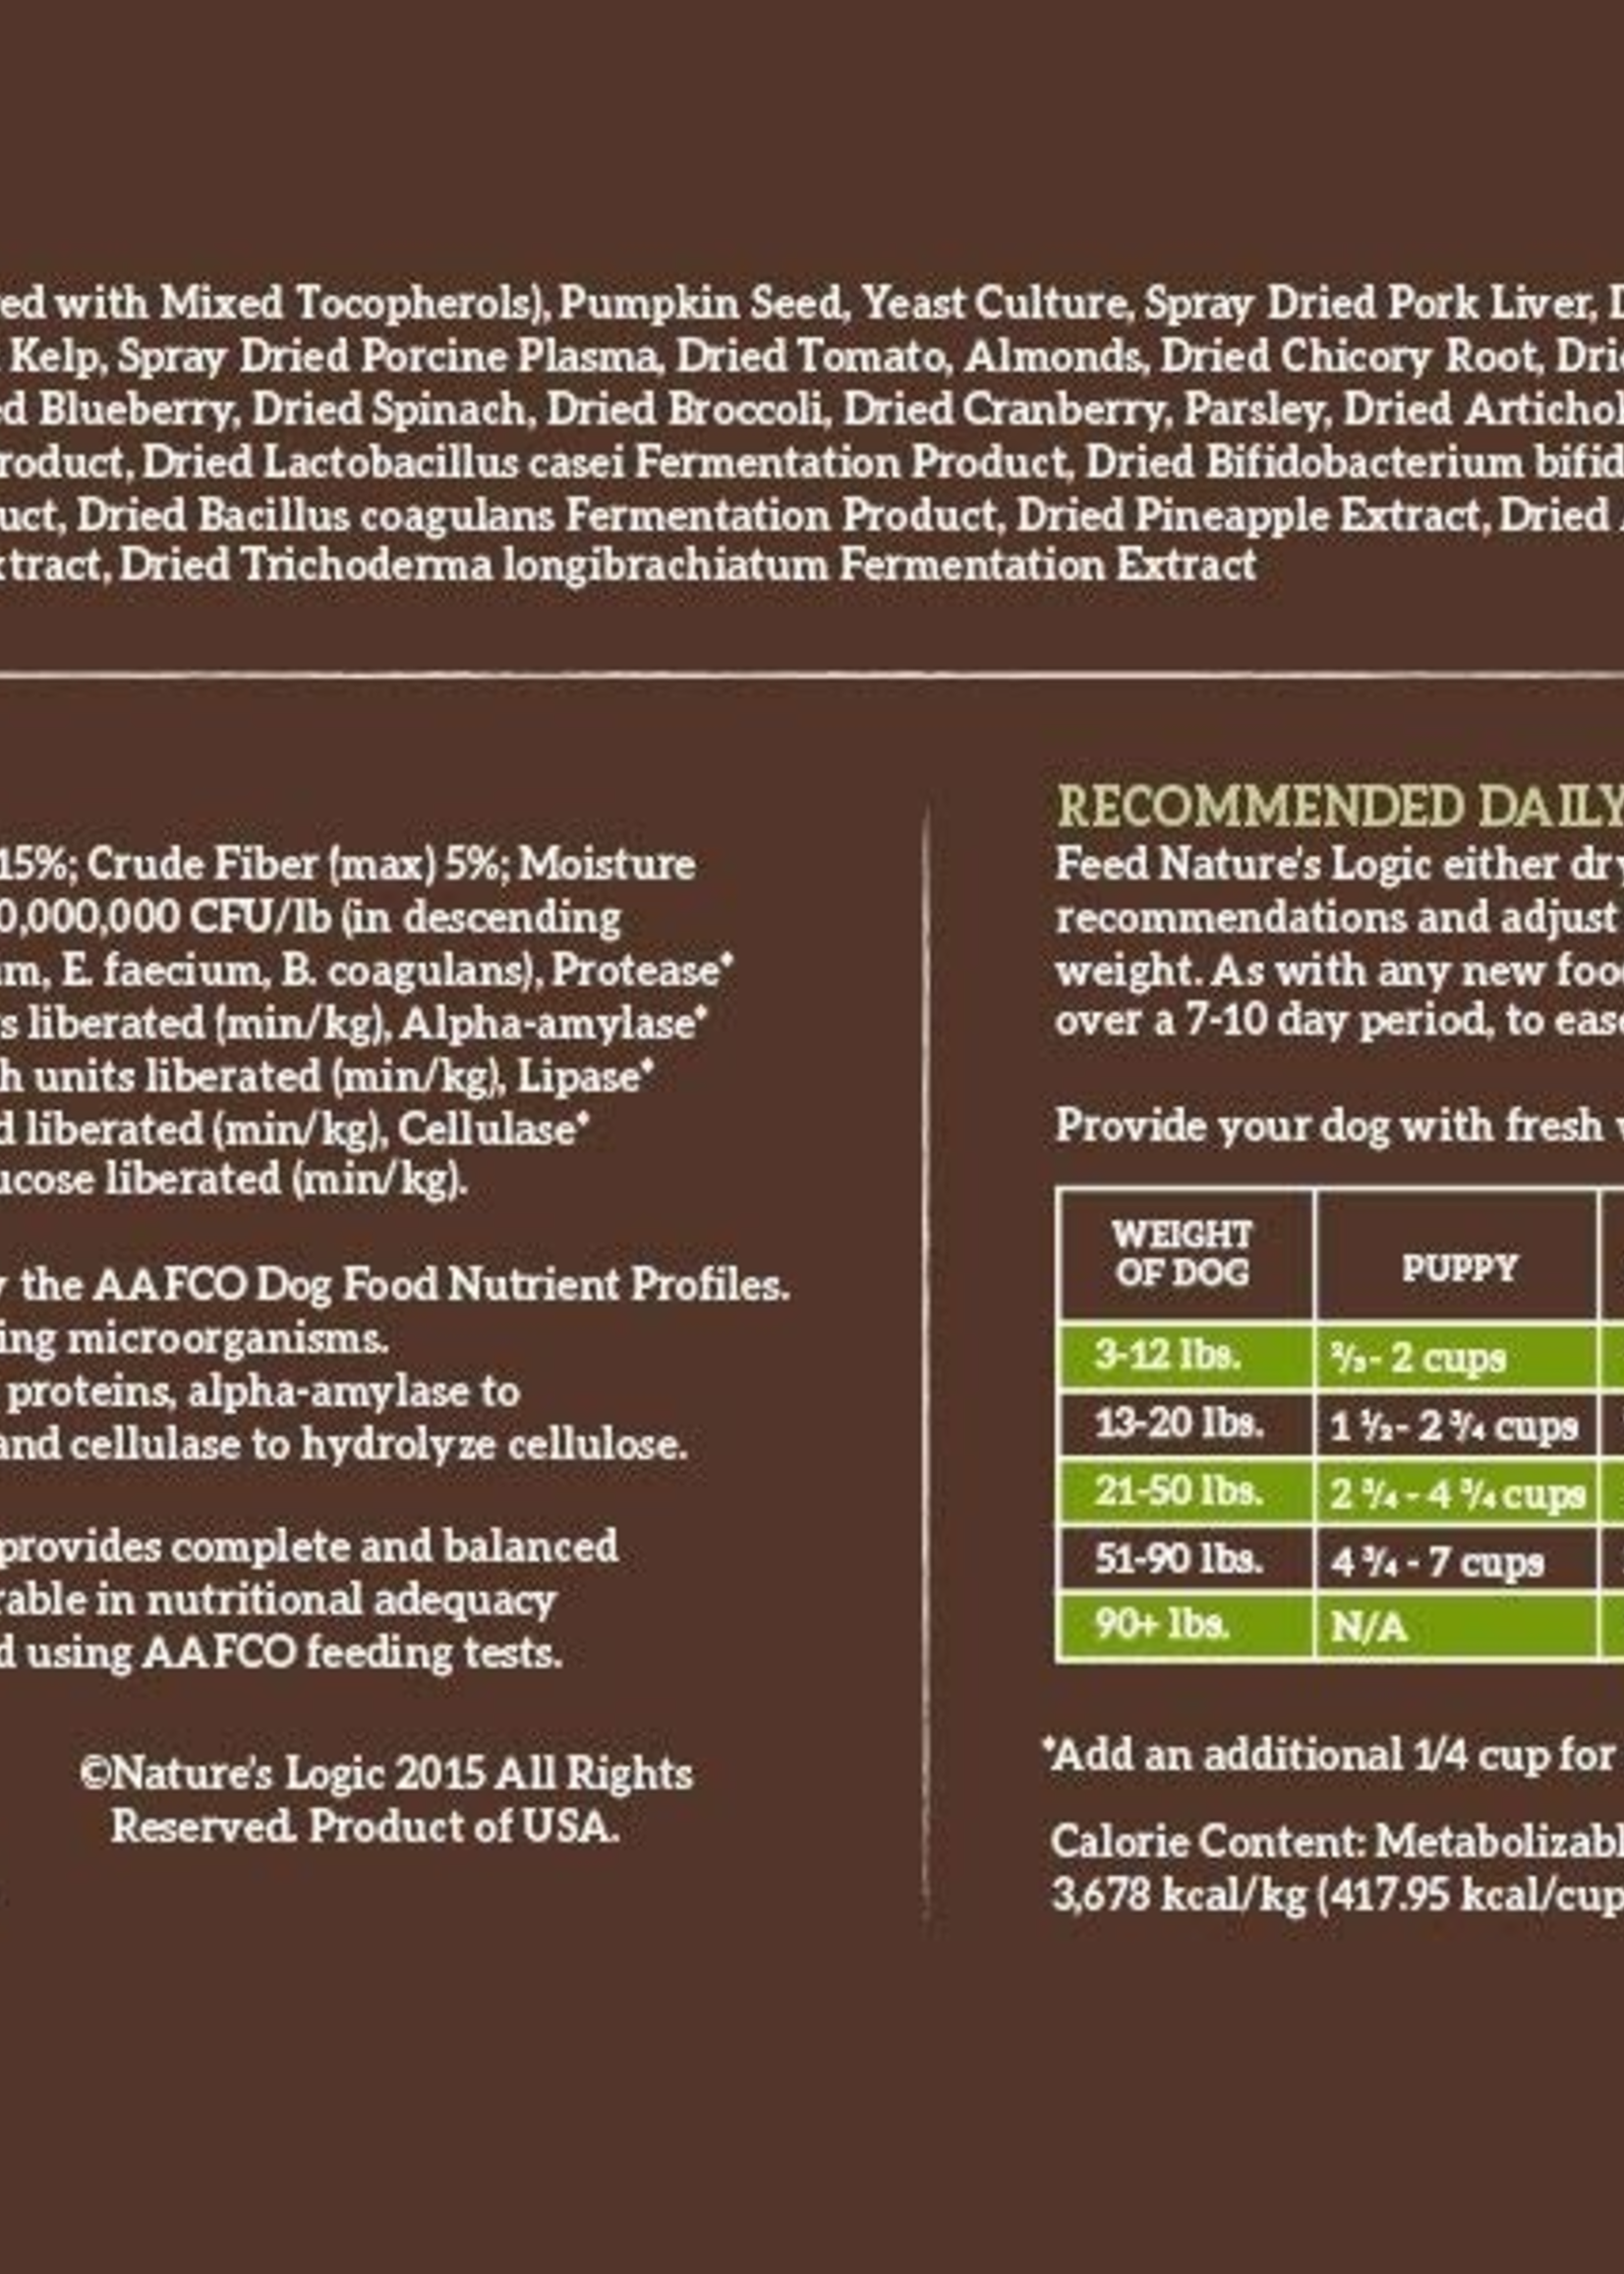 Nature's Logic Nature's Logic Turkey Meal Feast Dry Dog Food 13lbs